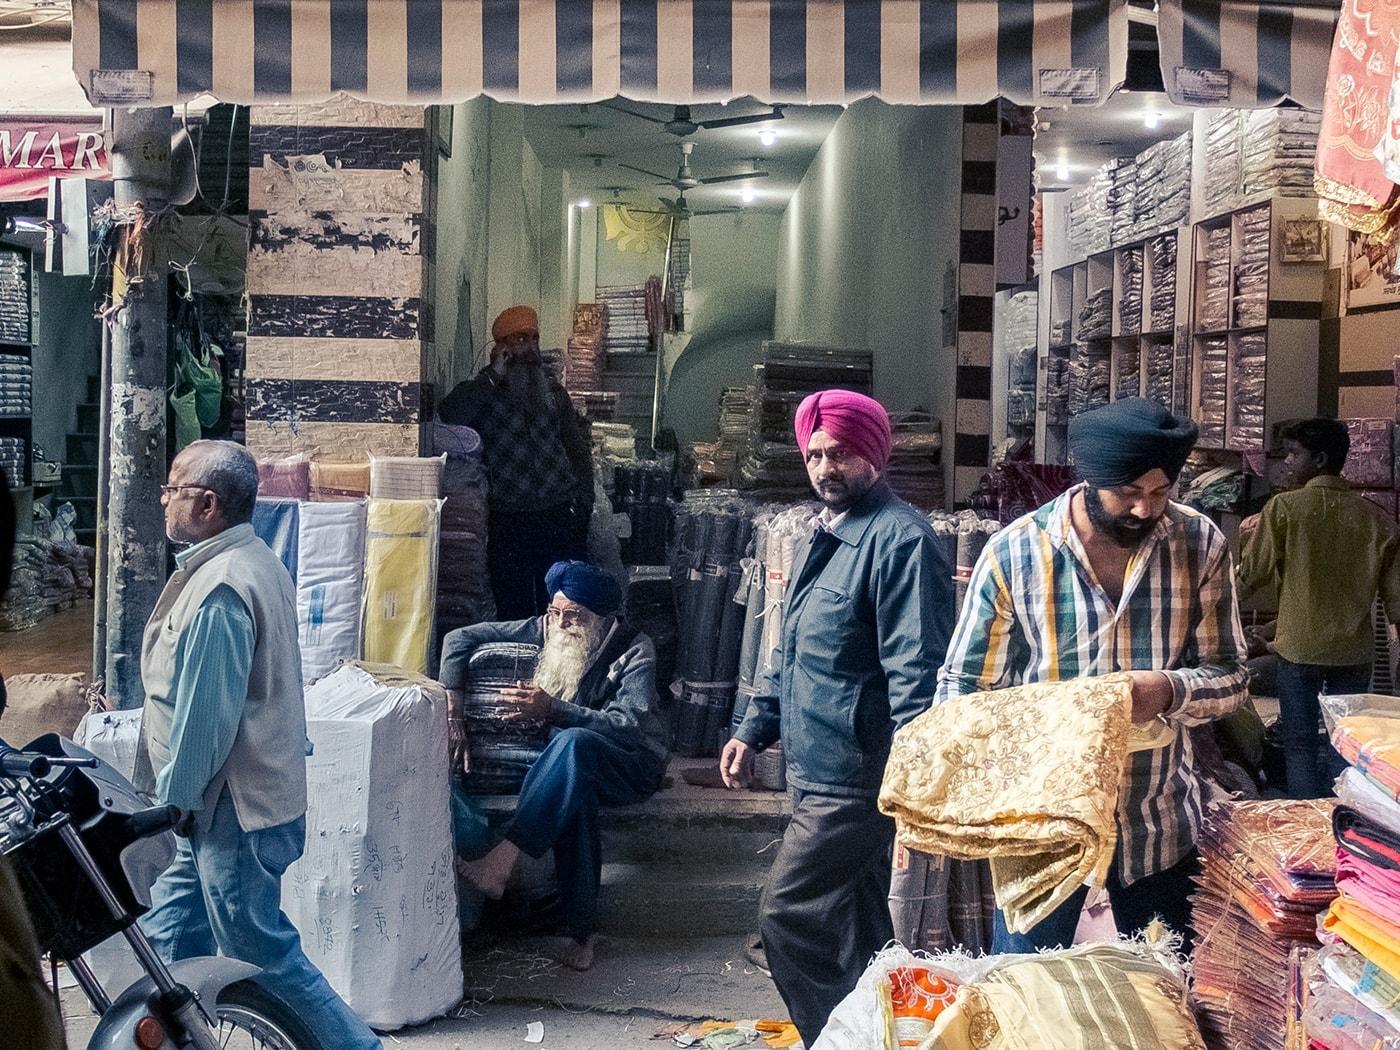 viaggio in india amritsar sikh